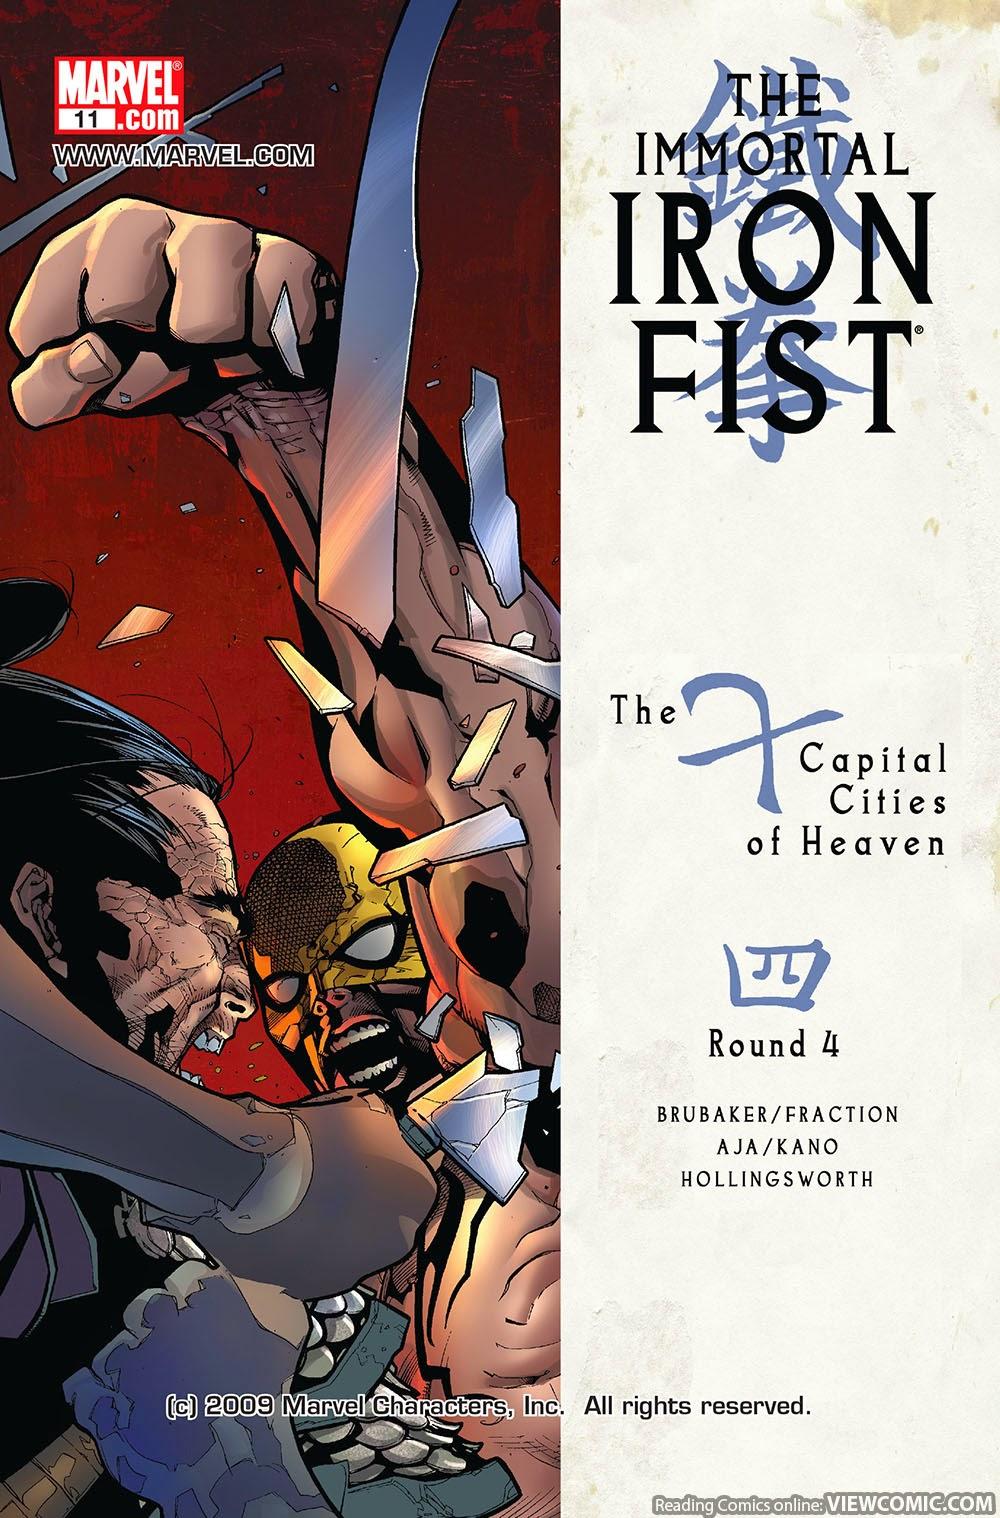 Seems the immortal iron fist 23